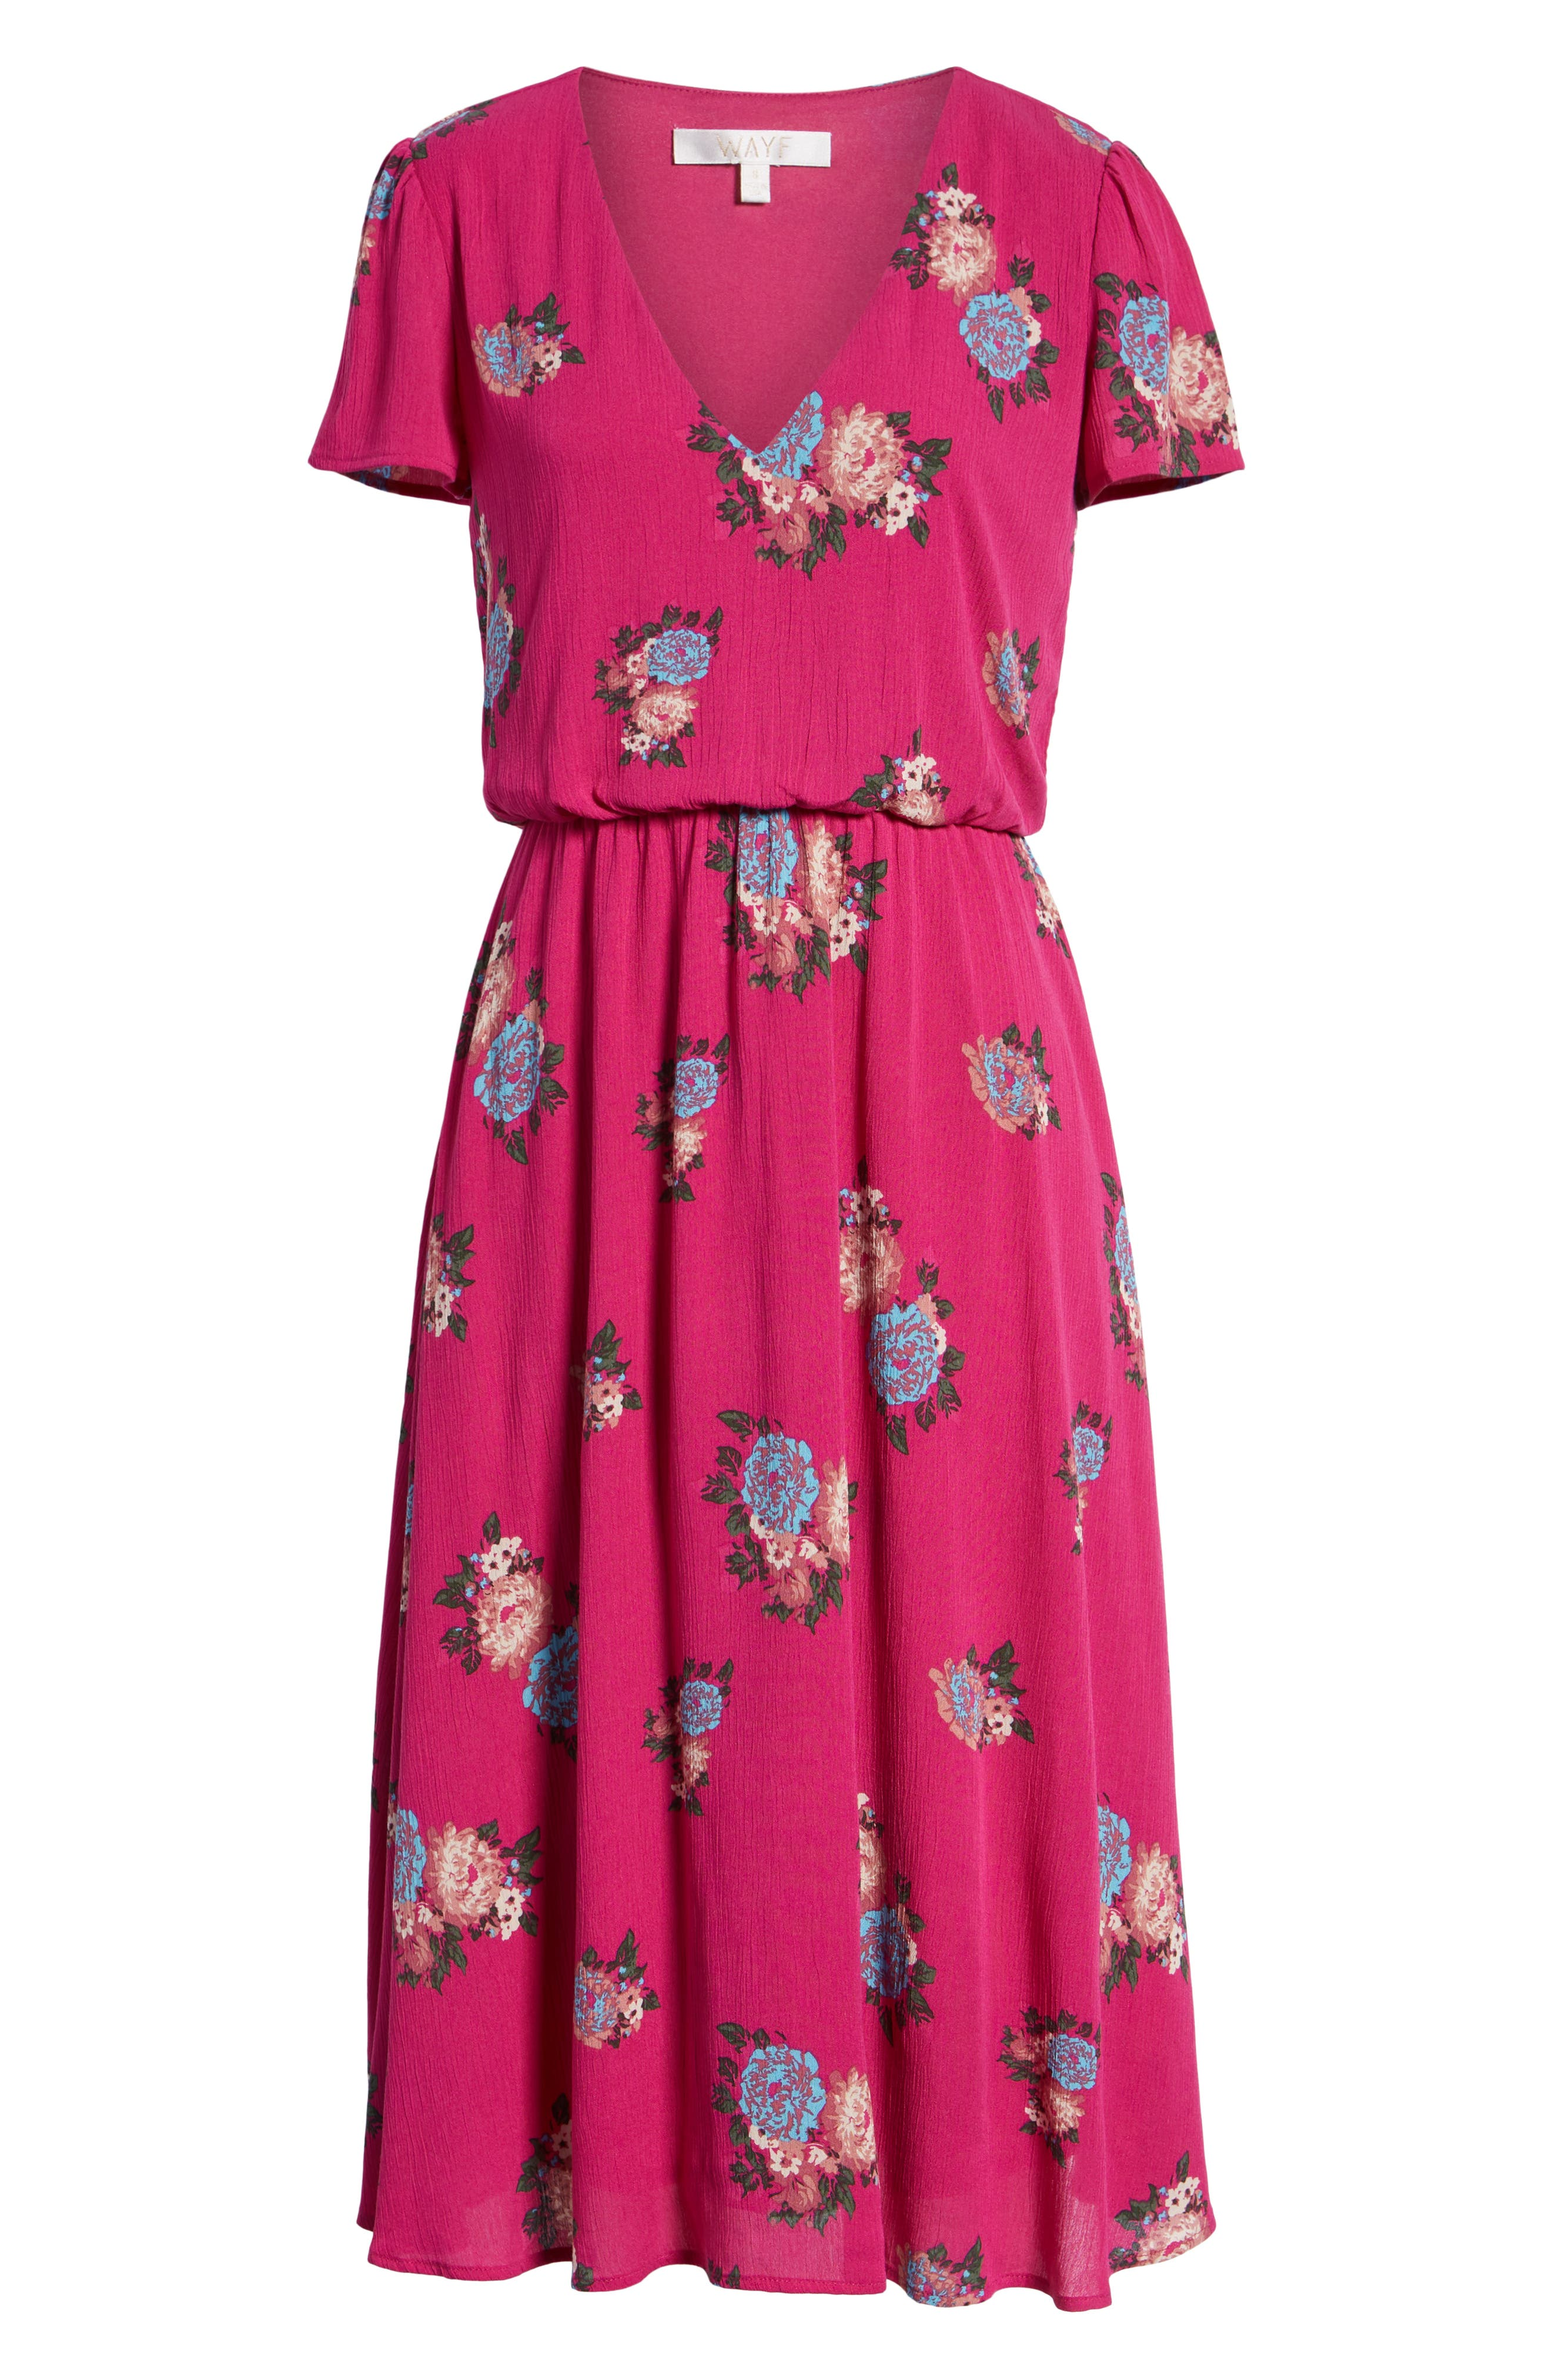 Blouson Midi Dress,                             Alternate thumbnail 7, color,                             Pink Berry Floral